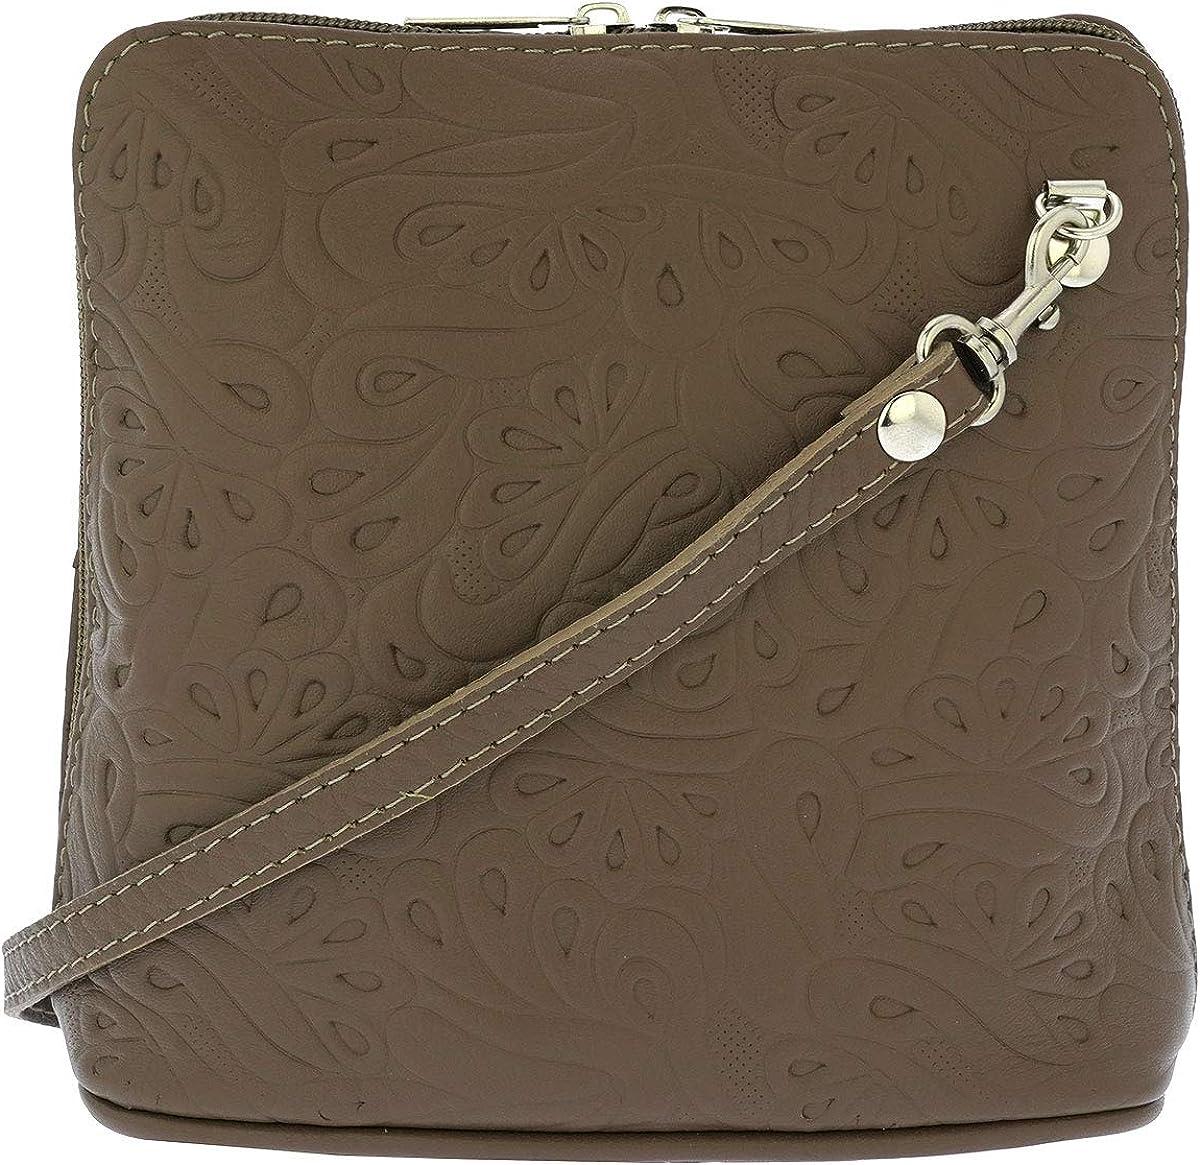 Fioretta Italian Embossed Genuine Leather Crossbody Shoulder Bag Clutch Handbag For Women